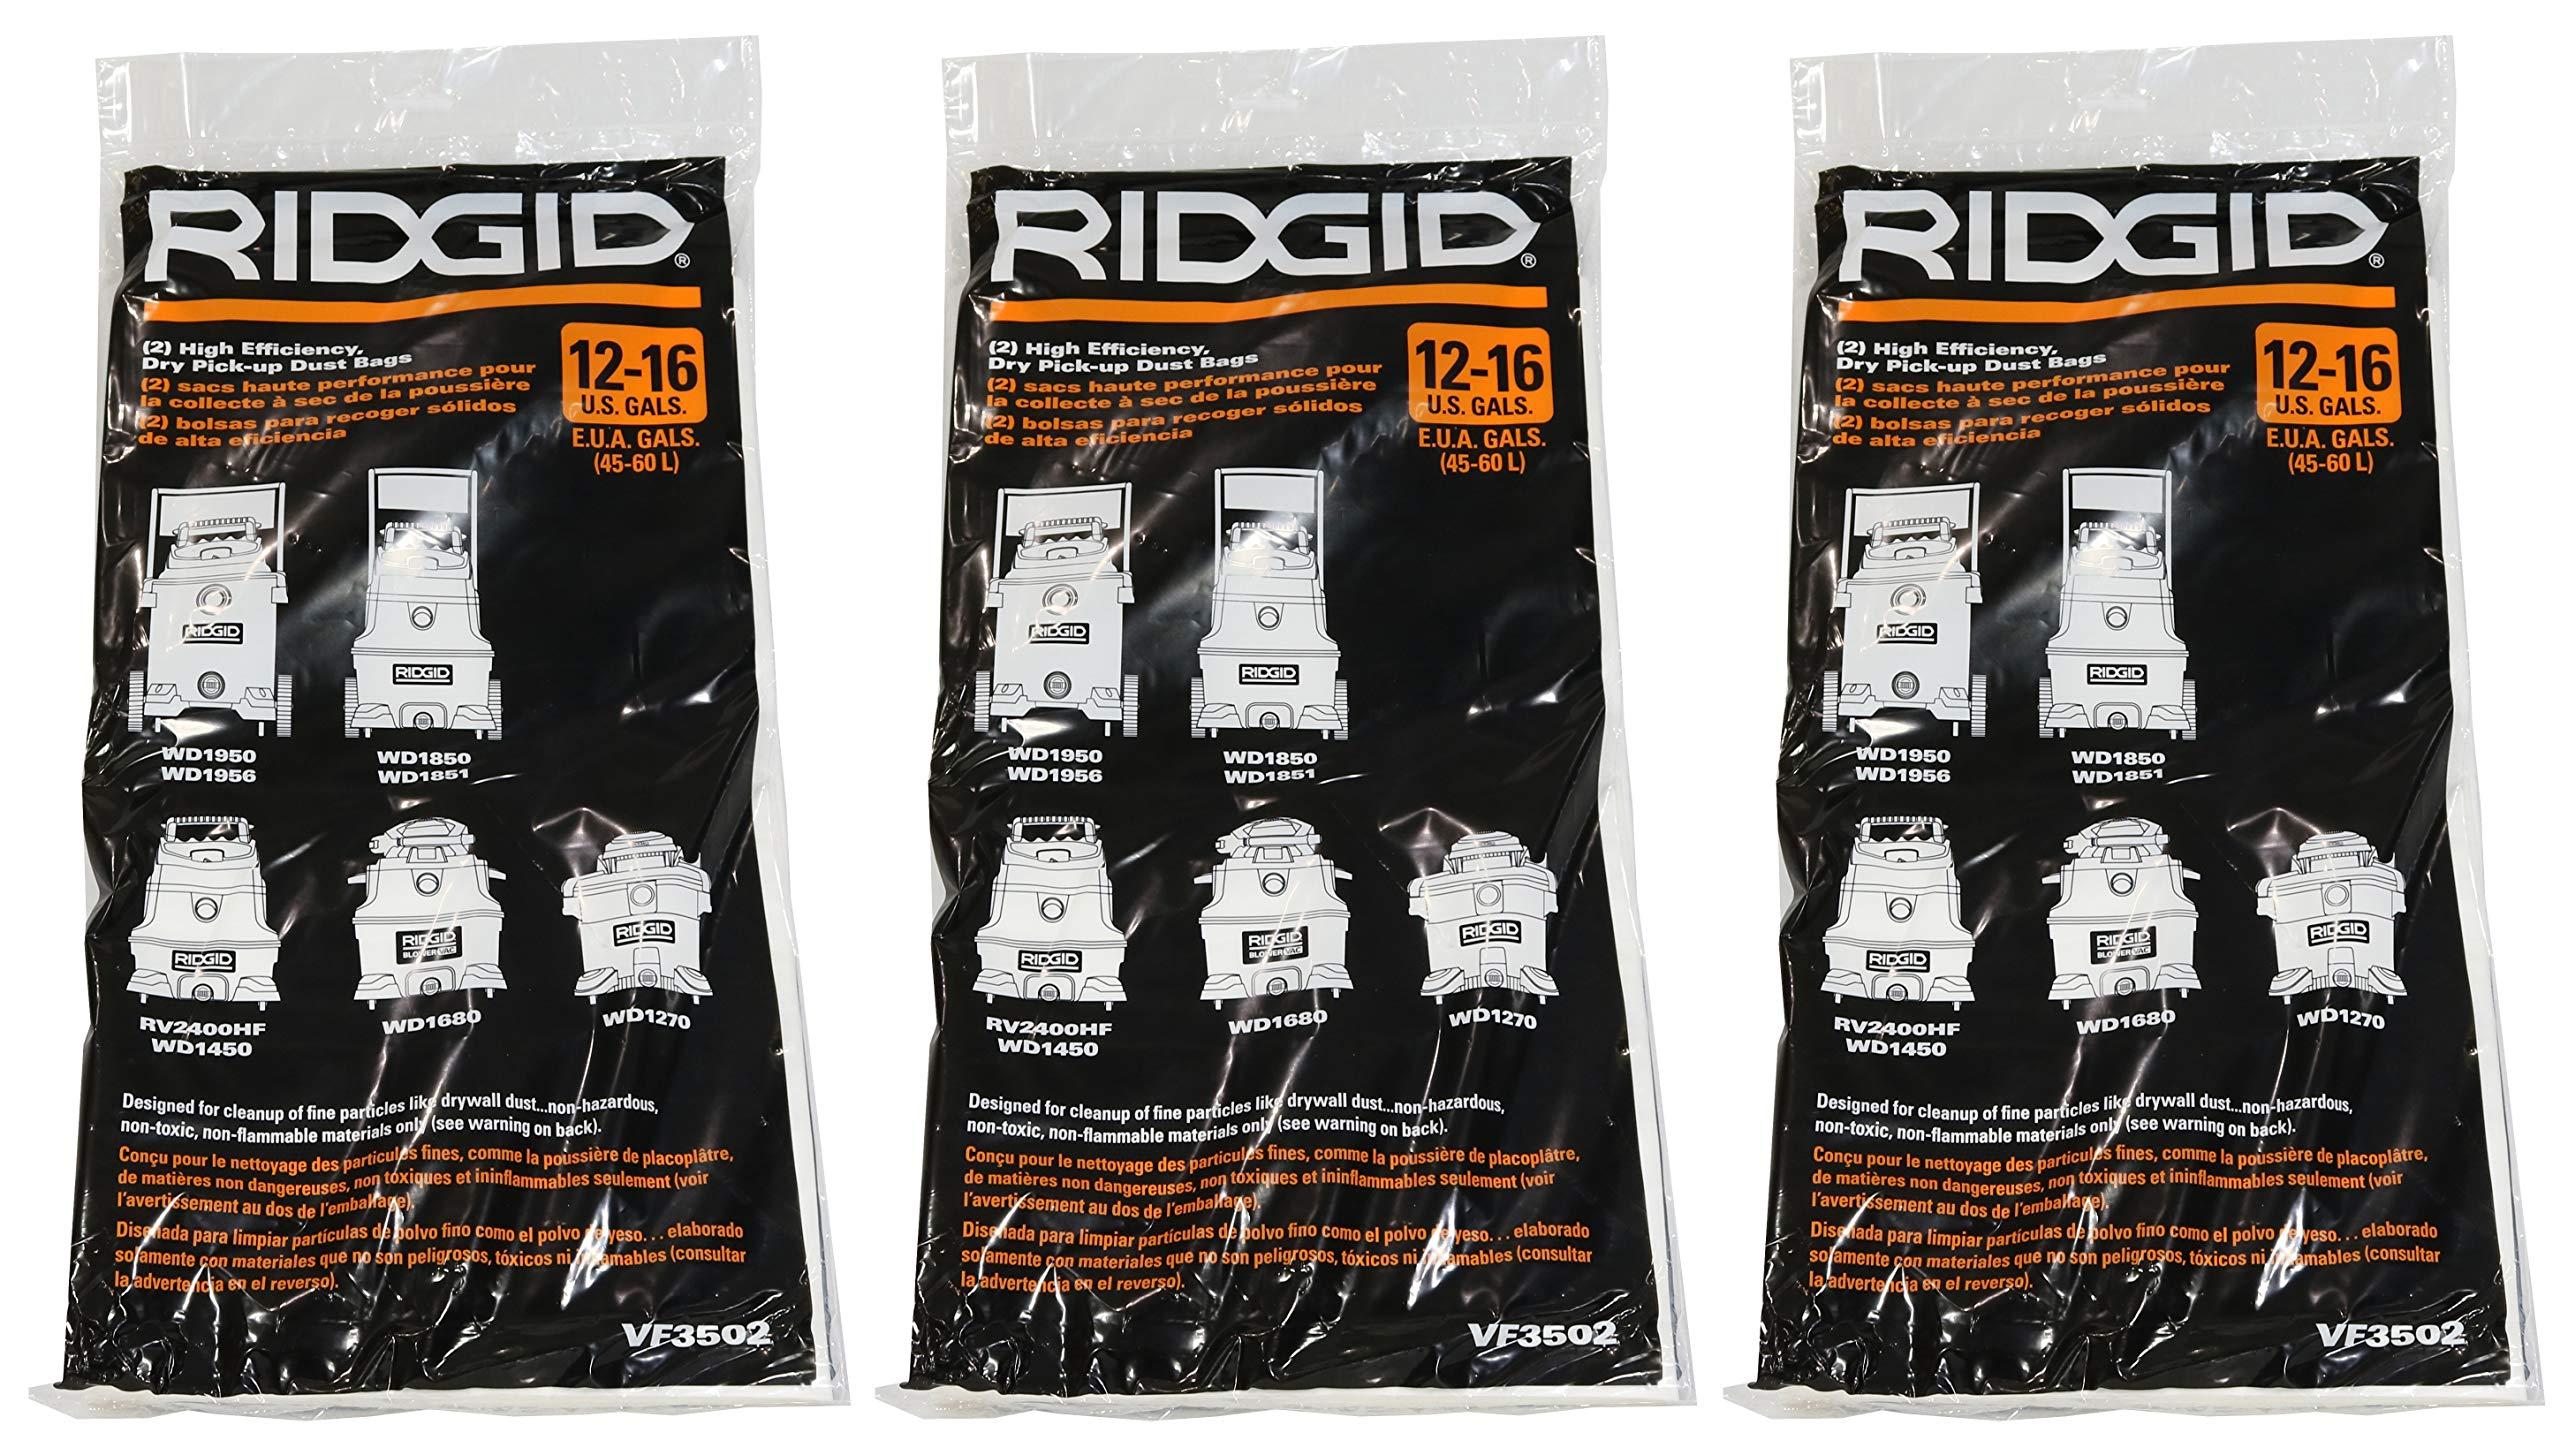 Ridgid VF3502 High Efficiency, Dry Pickup Dust Bags for 12 - 16 Gallon Ridgid Wet / Dry Vacuums (3 X Pack of 2) by Ridgid